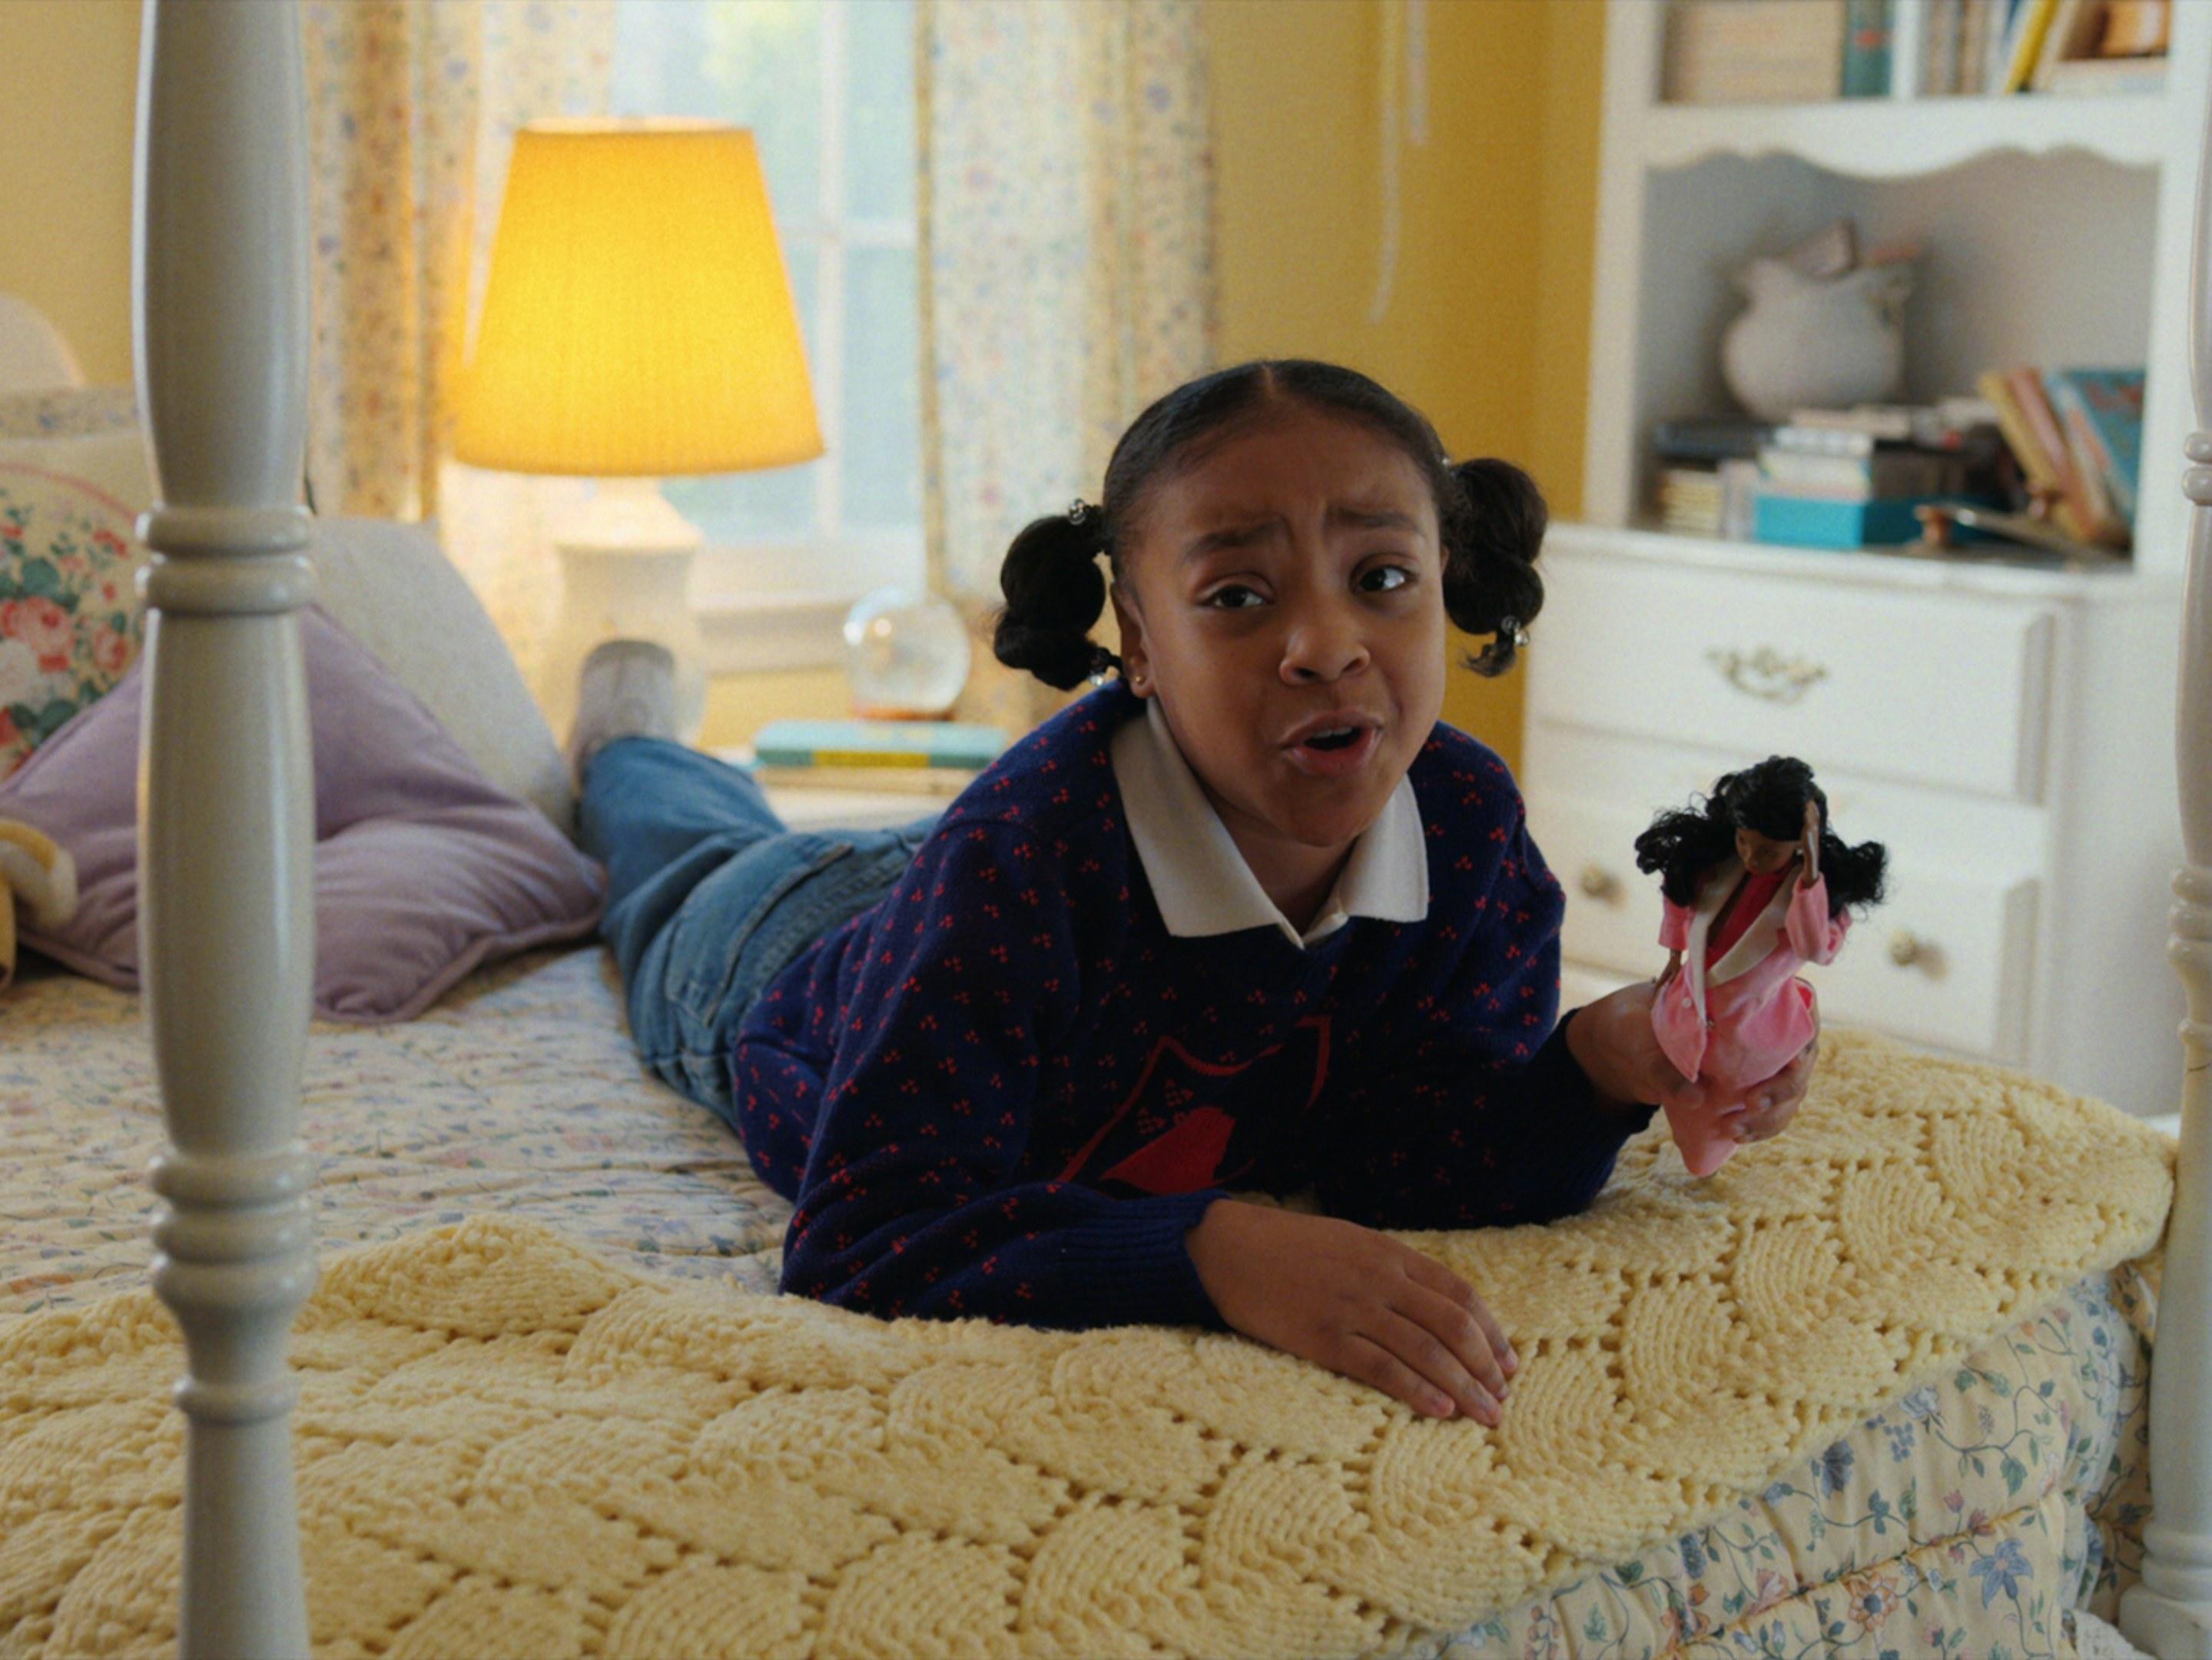 Priah Ferguson as Erica Sinclair in Netflix's Stranger Things